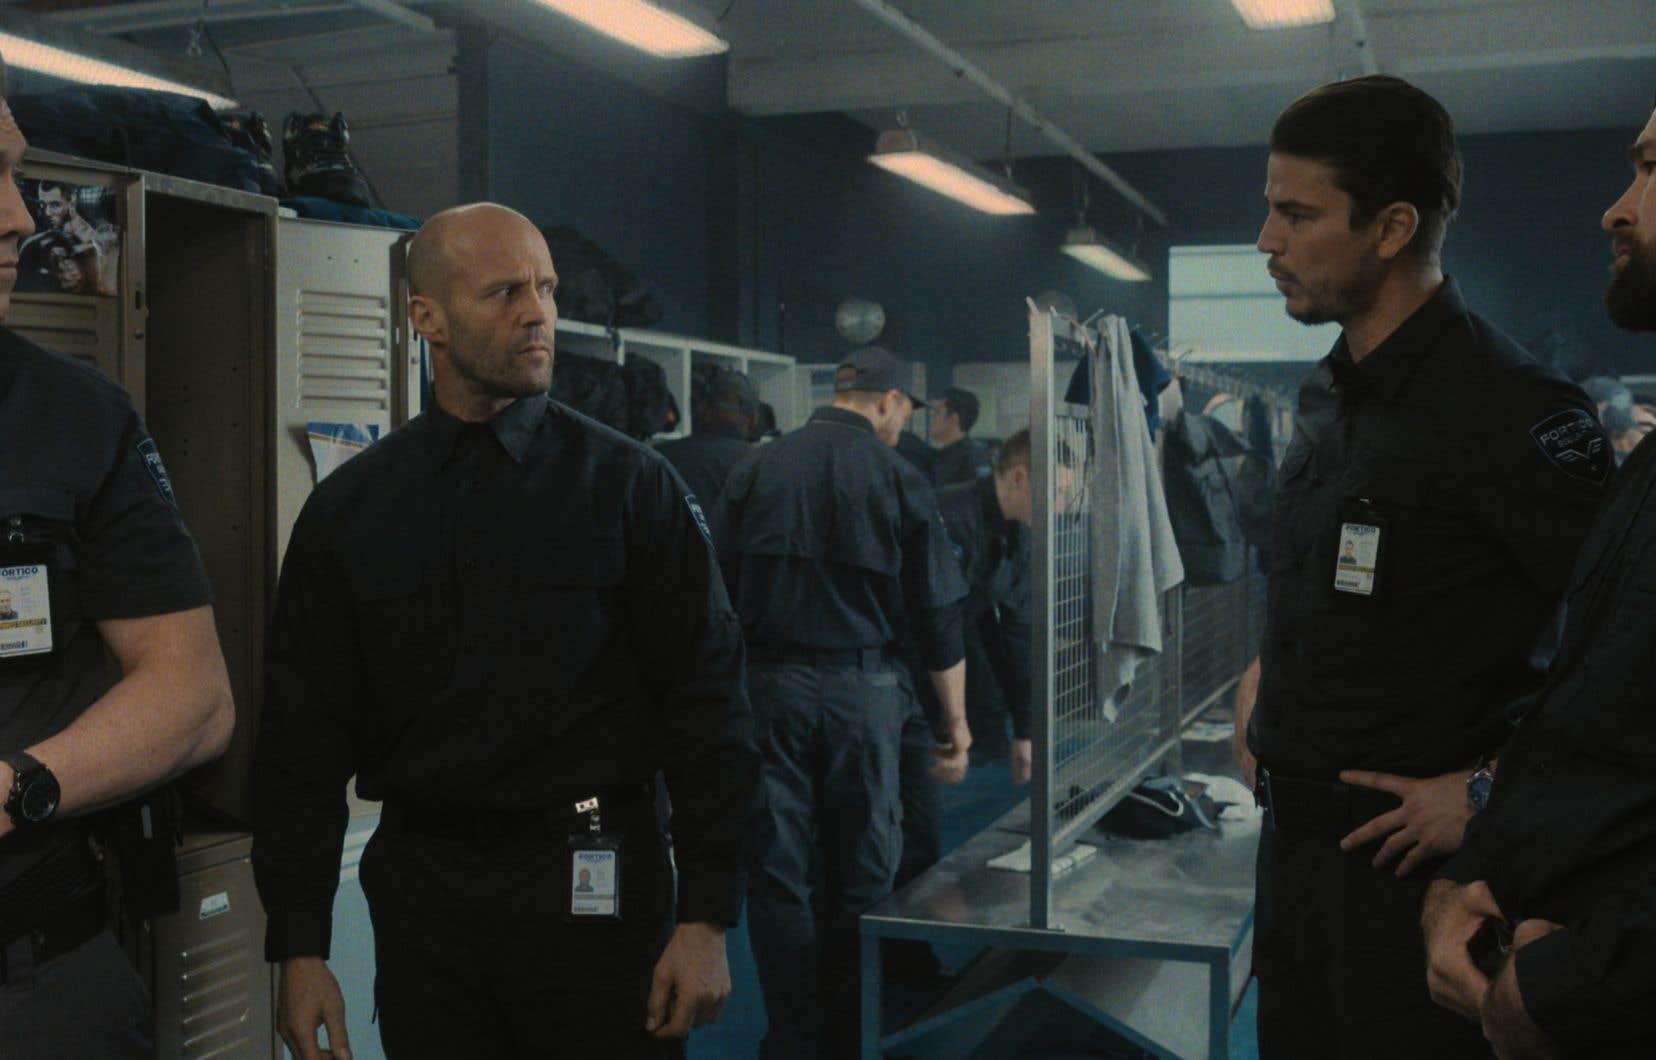 Holt McCallany (Bullet), Jason Statham (H), Josh Hartnett (Boy Sweat Dave) et Rocci Williams (Hollow Bob) dans le thriller de Guy Ritchie «Wrath of Man»